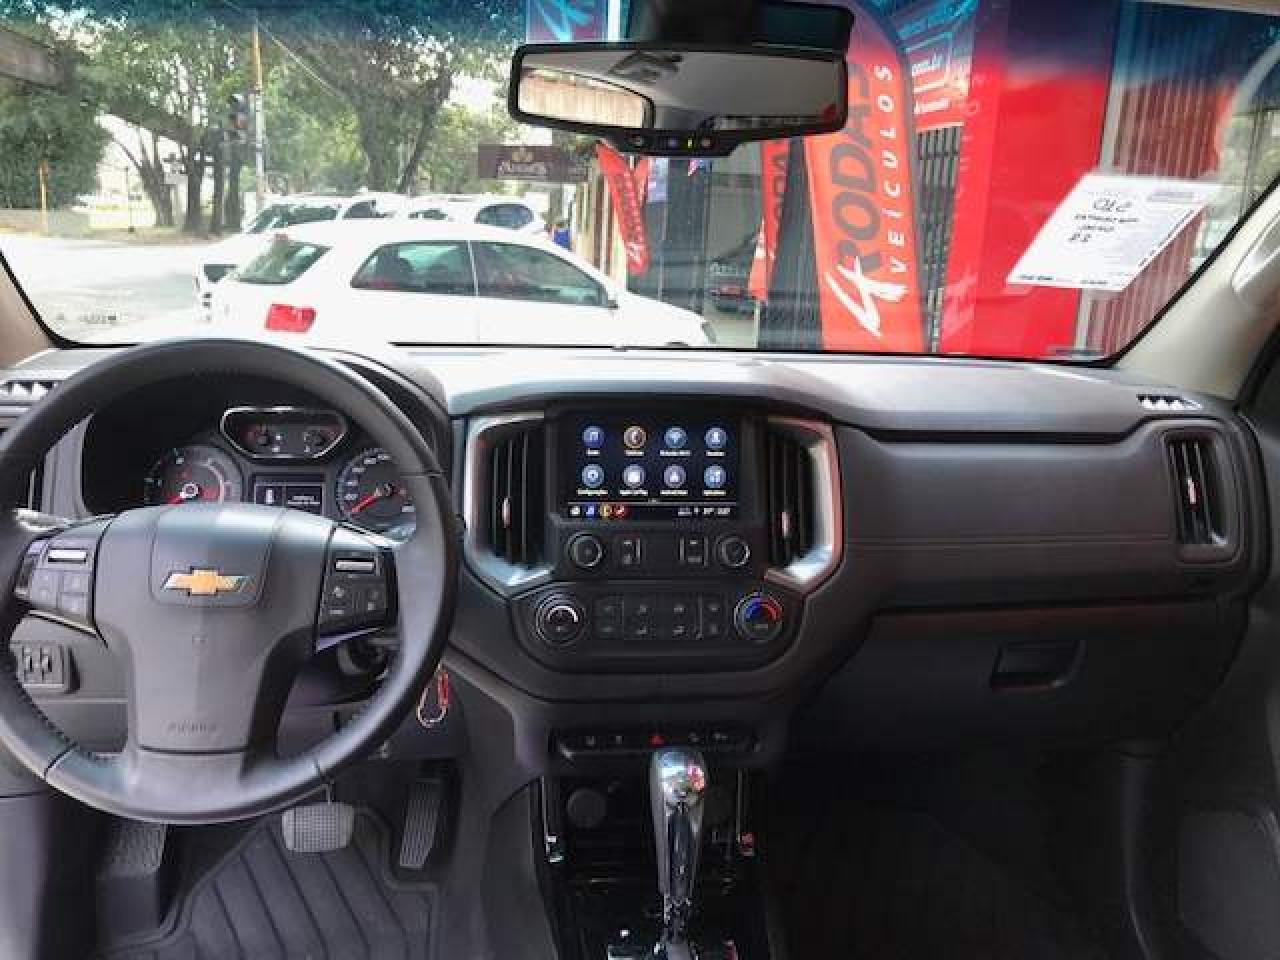 S10 2.8 12V HIGH COUNTRY CABINE DUPLA 4X4 TURBO DIESEL AUTOMÁTICO